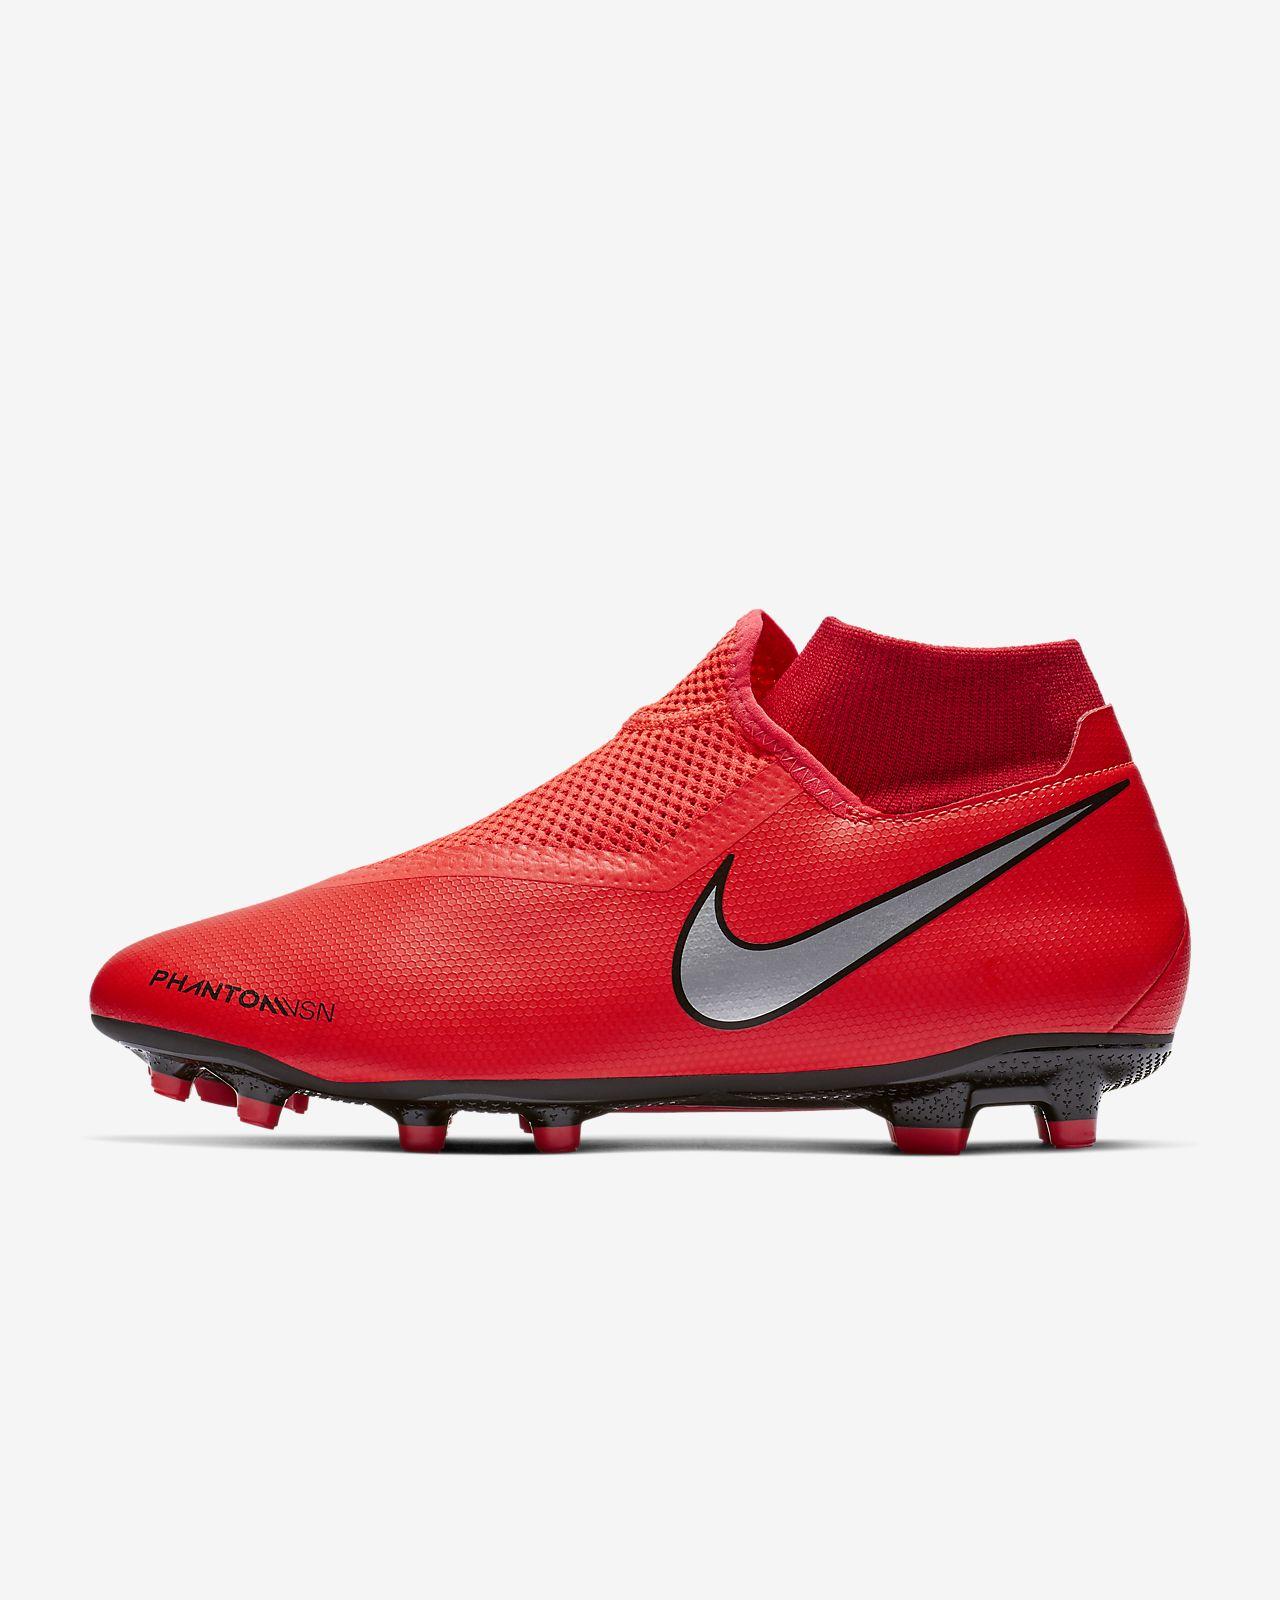 Calzado de fútbol para múltiples superficies Nike PhantomVSN Academy Dynamic Fit Game Over MG